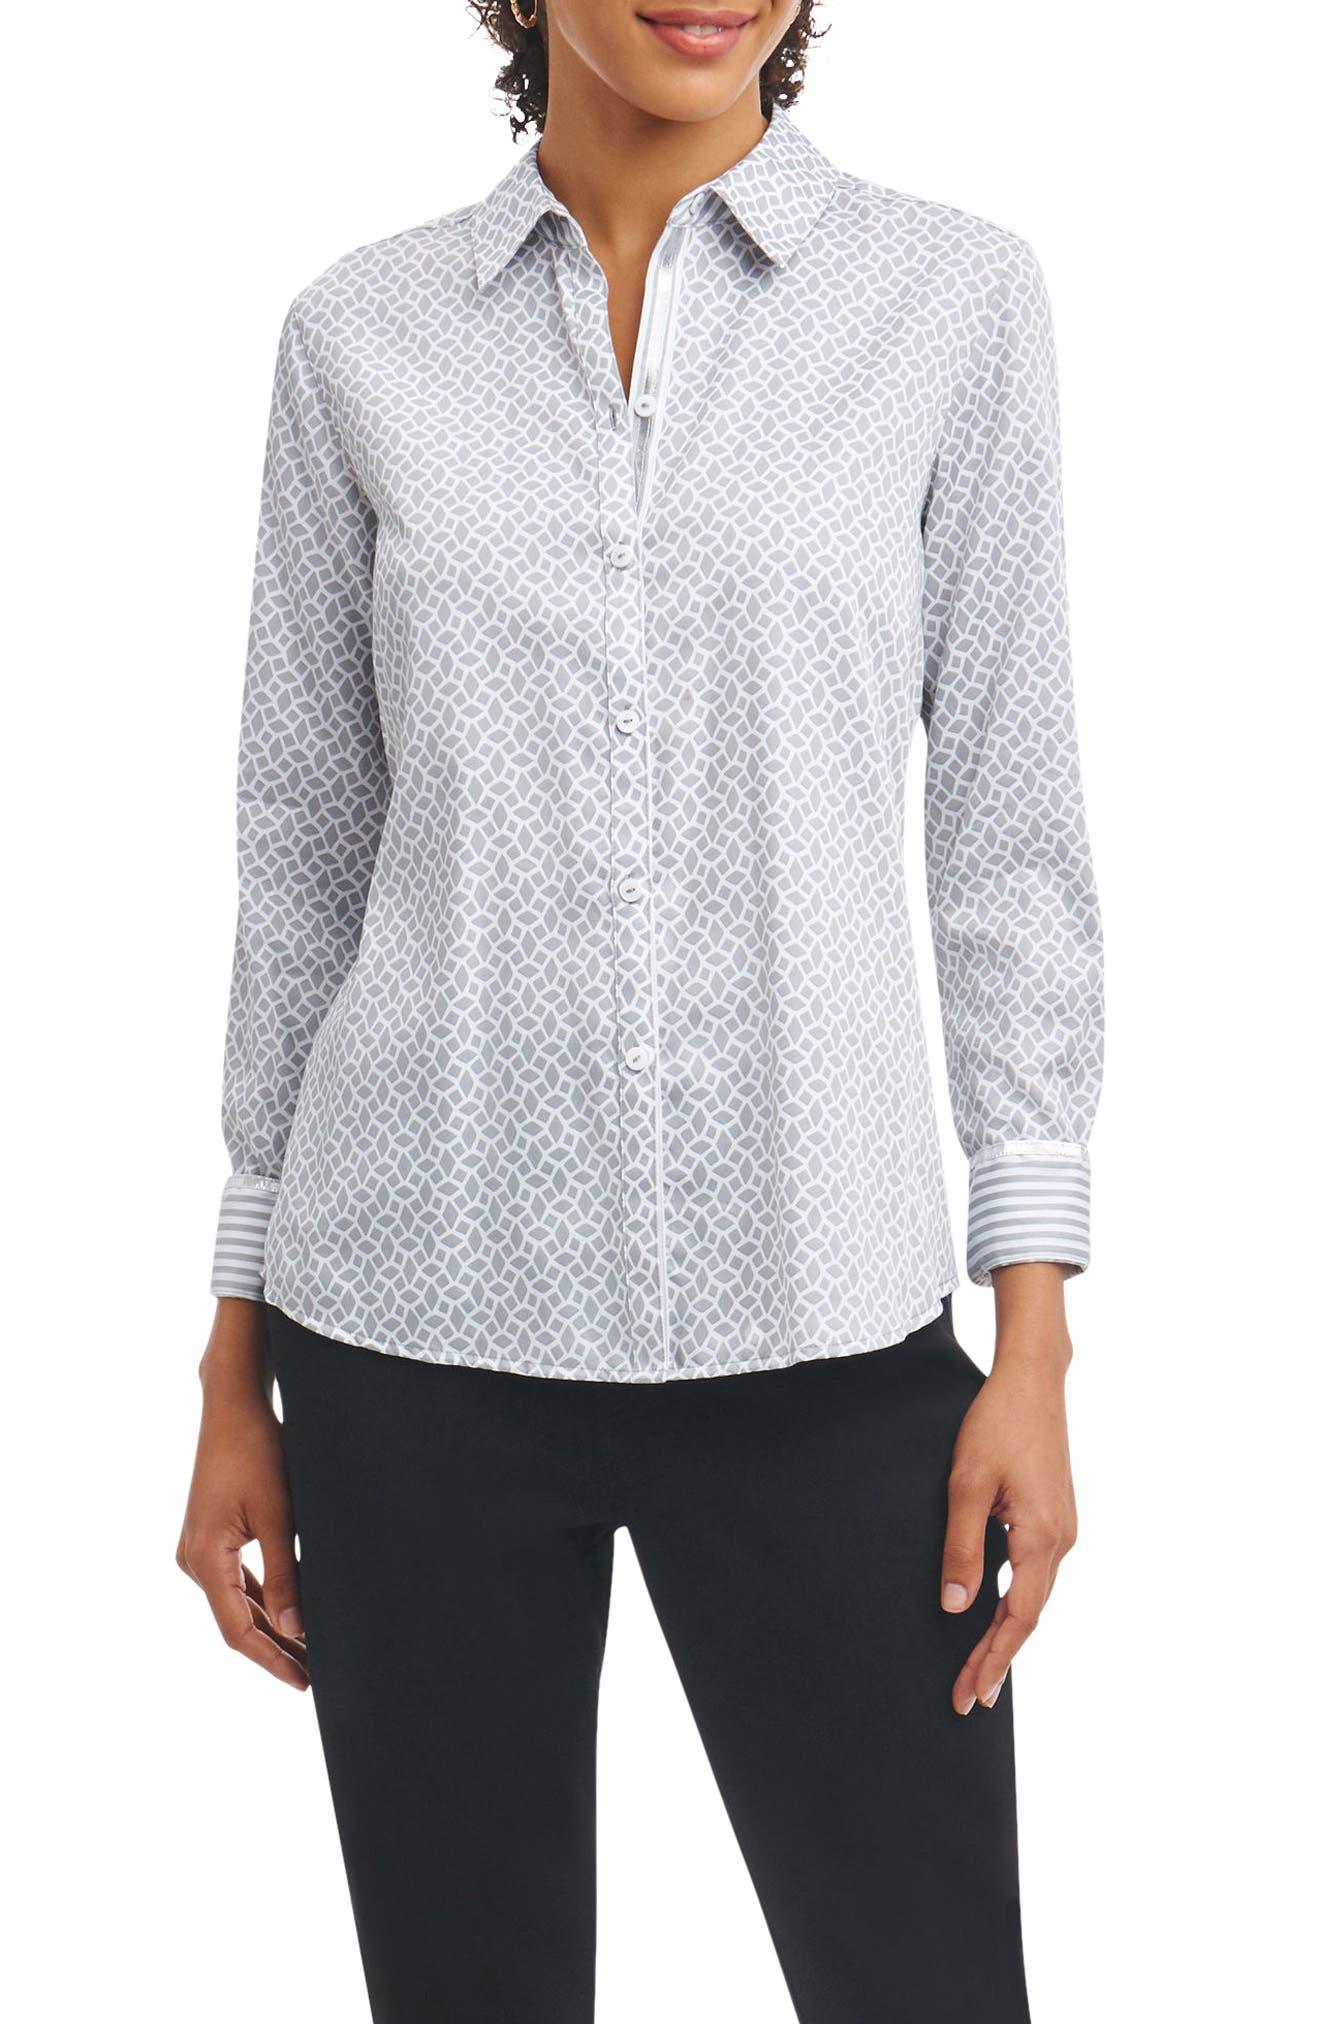 Alternate Image 1 Selected - Foxcroft Ava Wrinkle Free Geo Print Shirt